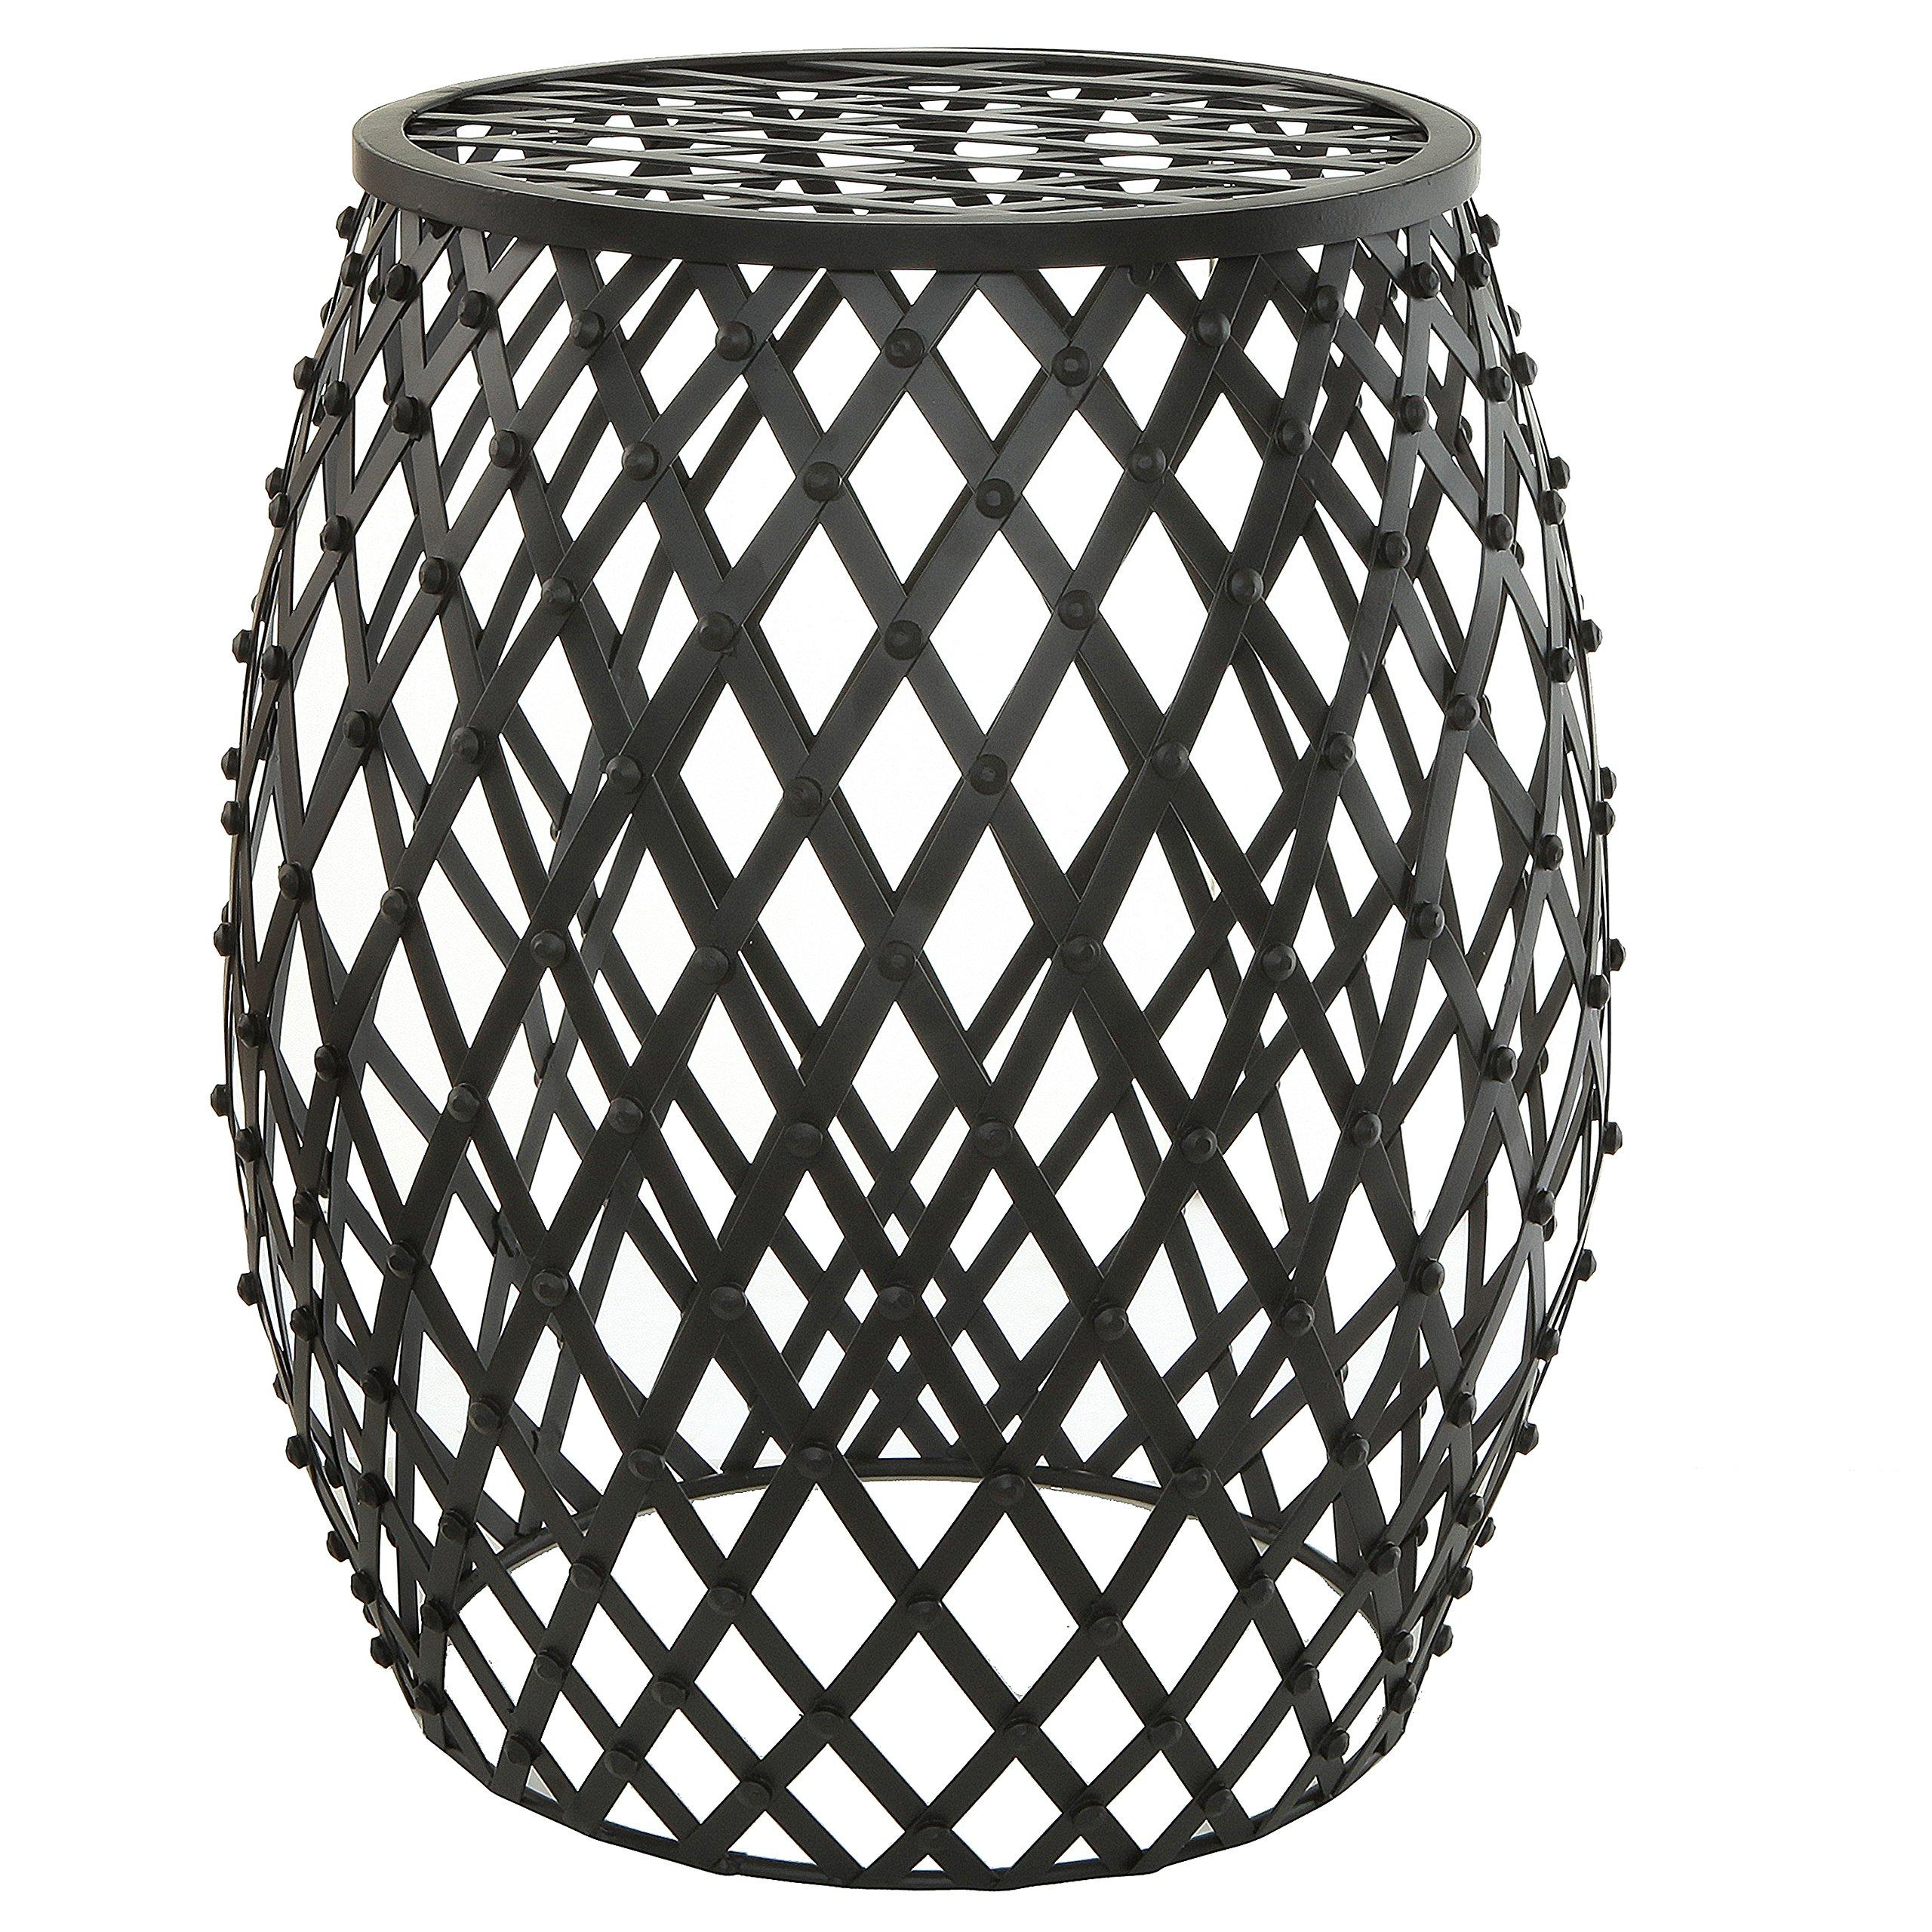 Bohemian Chic Openwork Lattice Design Black Metal Garden Stool / Decorative Accent Stand - MyGift